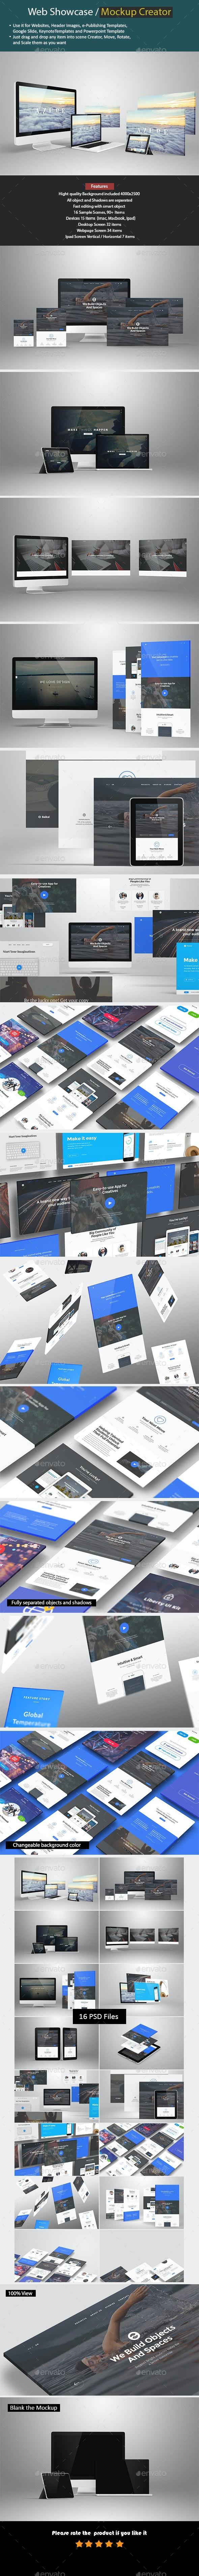 Web Showcase / Mockup Creator - Product Mock-Ups Graphics